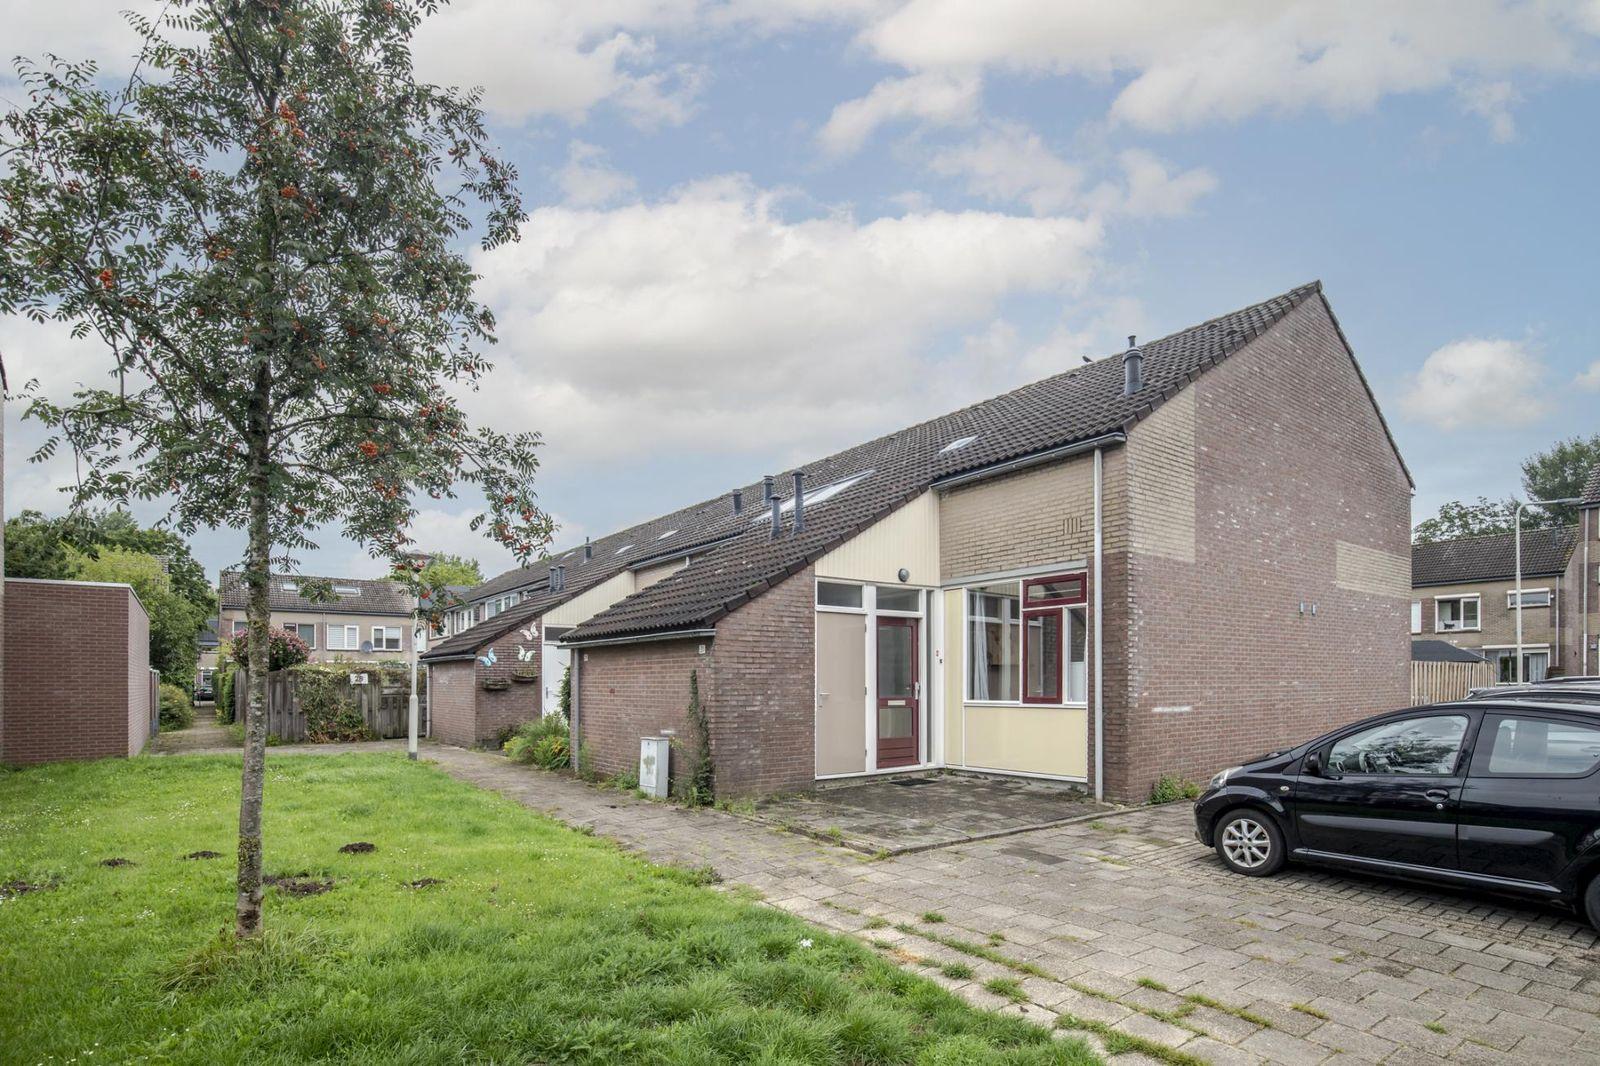 Helmondstraat 31, Arnhem